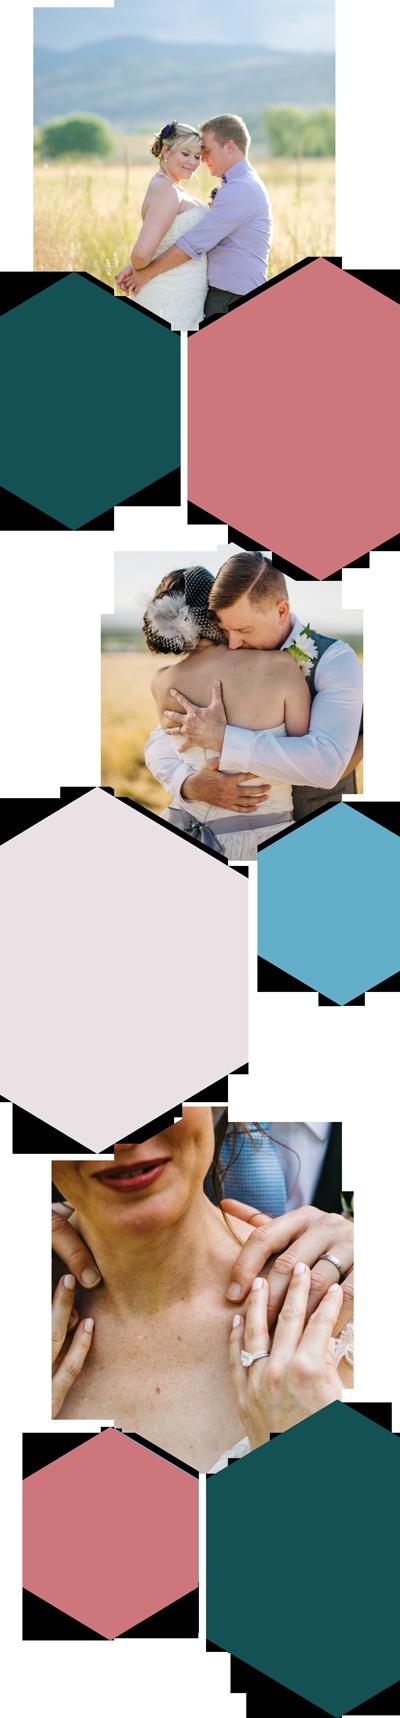 elopement-photographer-colorado-elopement-photograher-adventure-elopement-photographer-denver-elopement-photographer-intimate-wedding-photographer_expertise.png